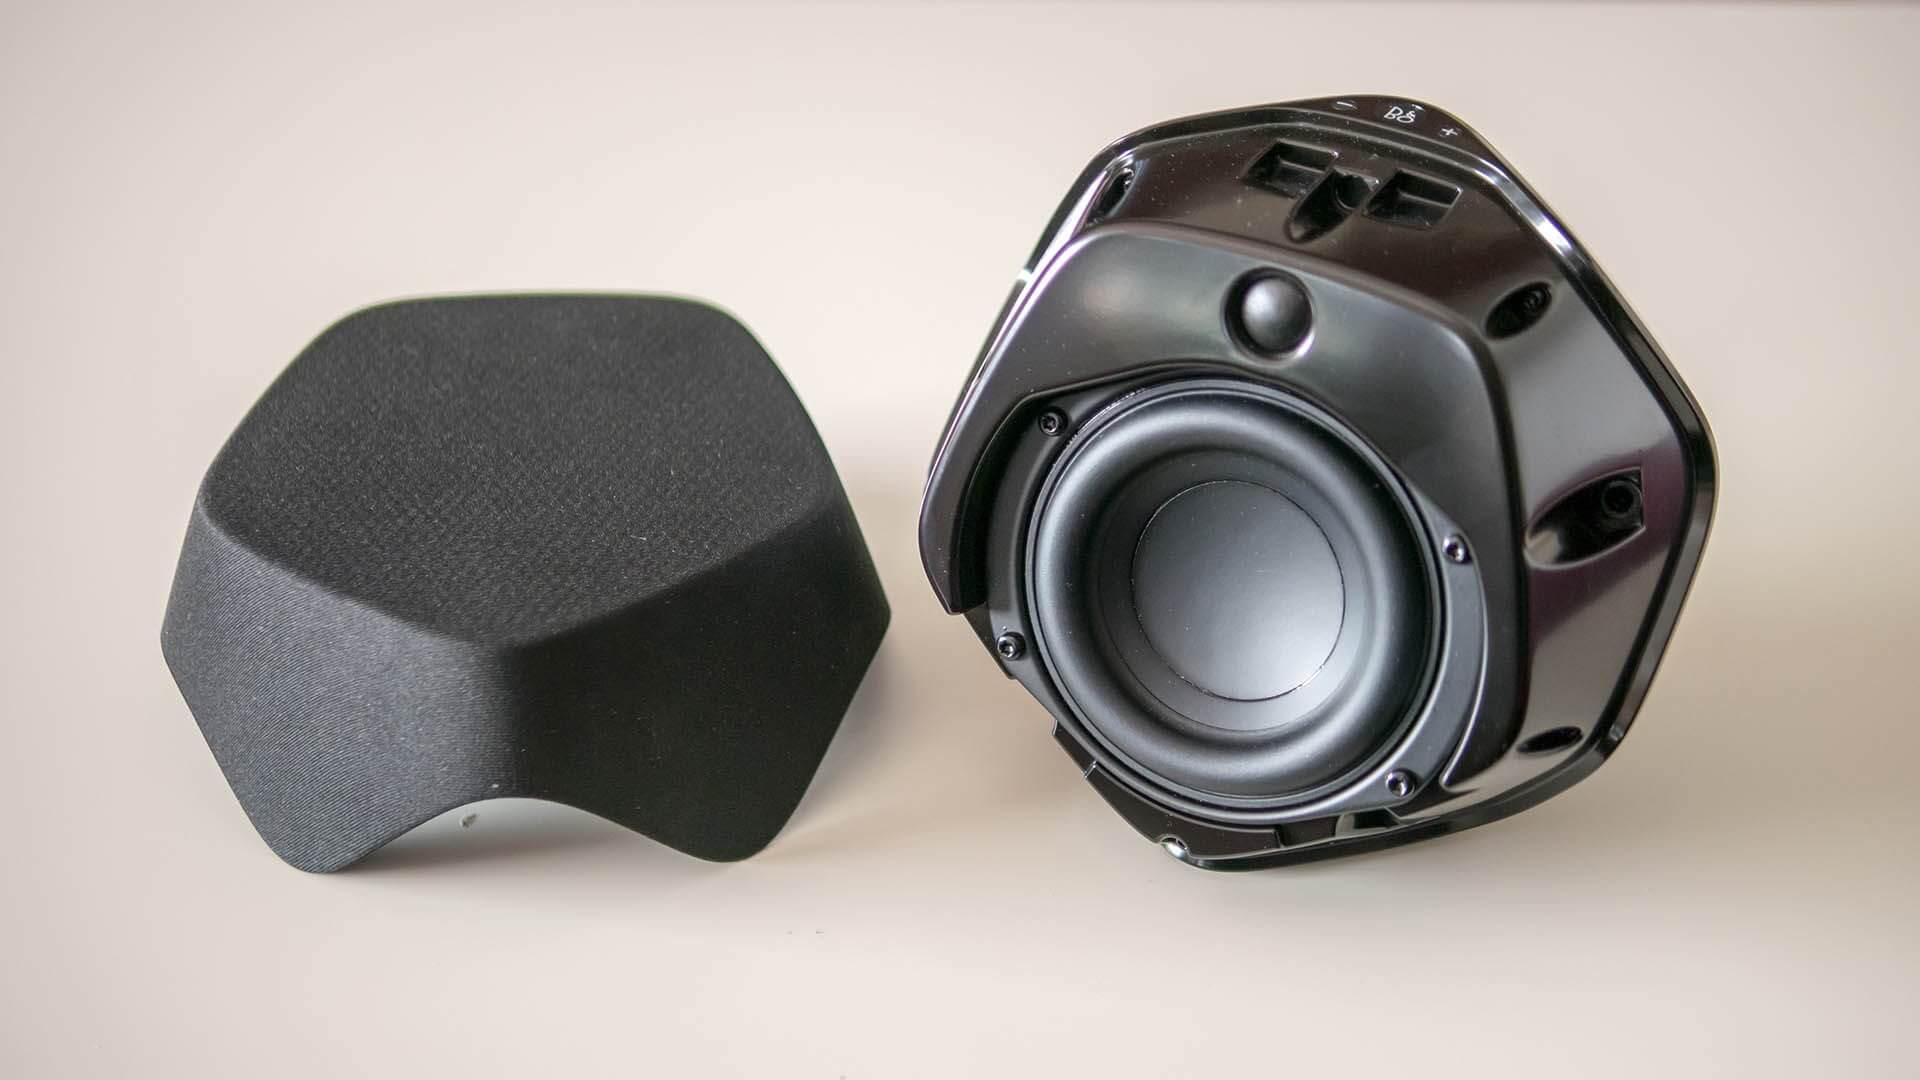 Bang & Olufsen BeoPlay S3 Bluetooth Speaker